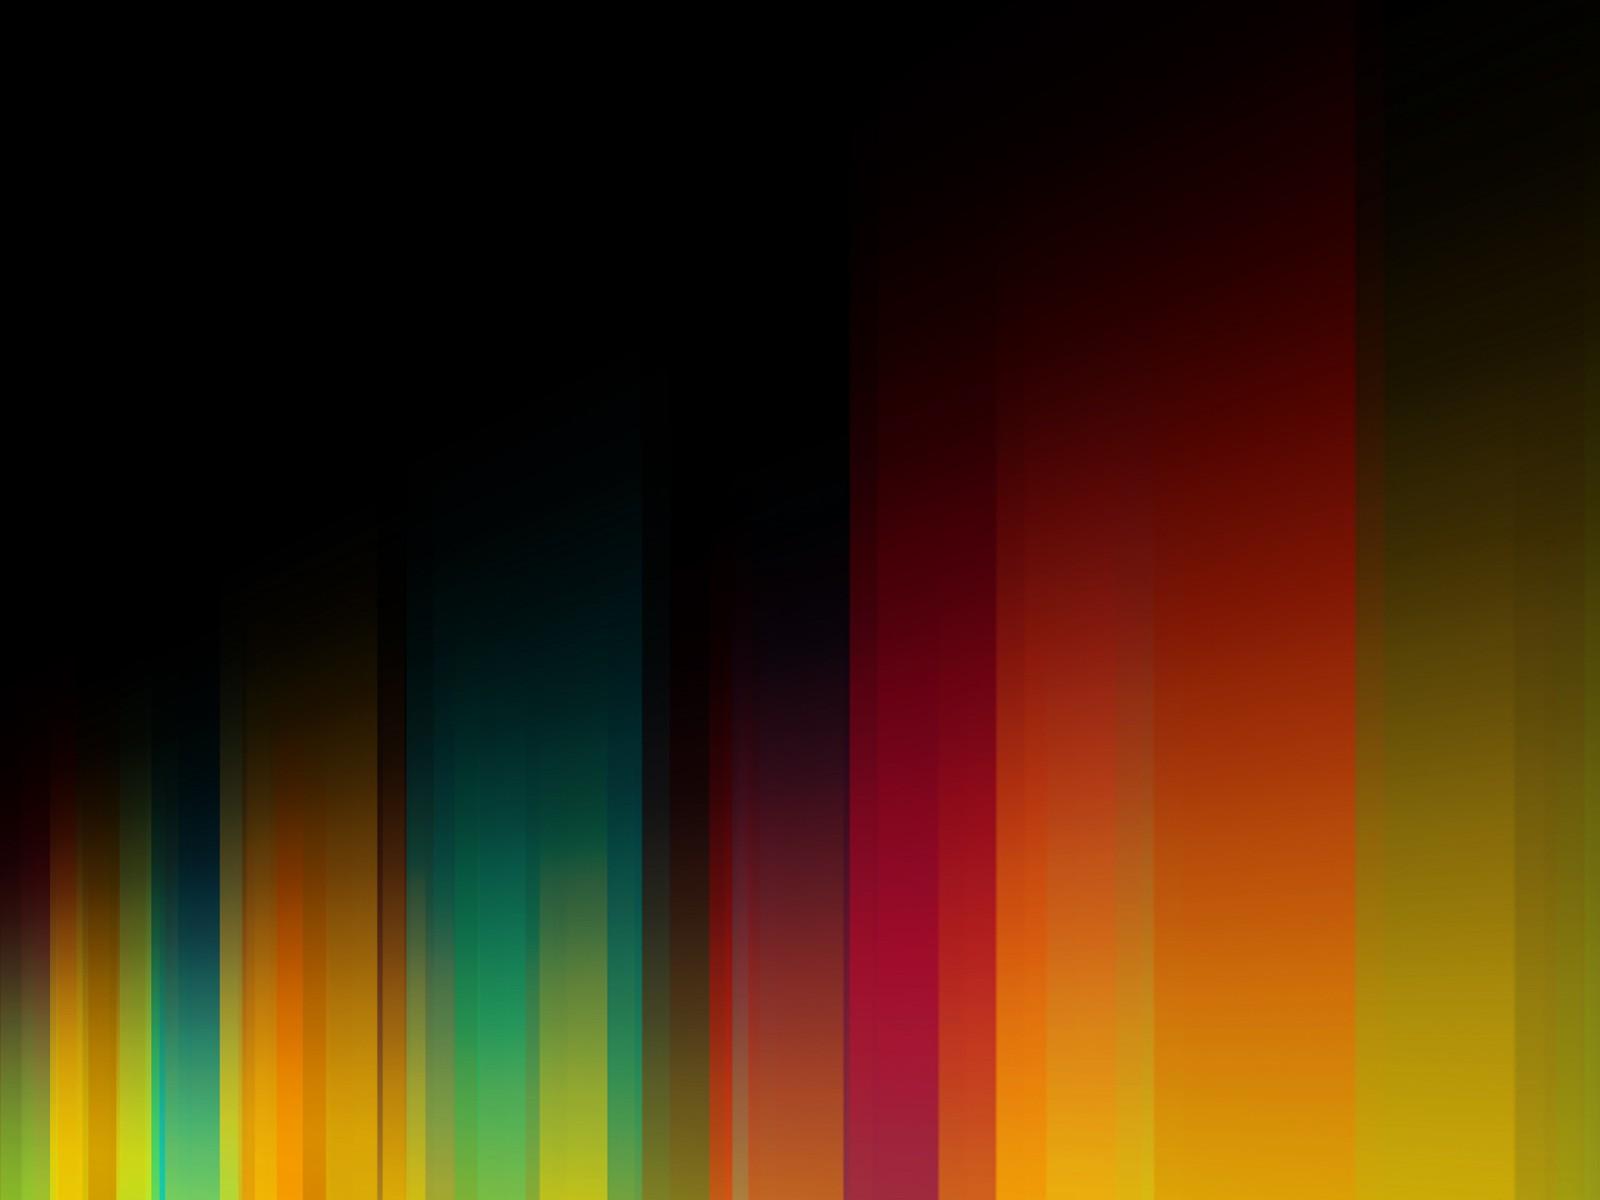 Wallpaper Sinar Matahari Abstrak Minimalis Hijau